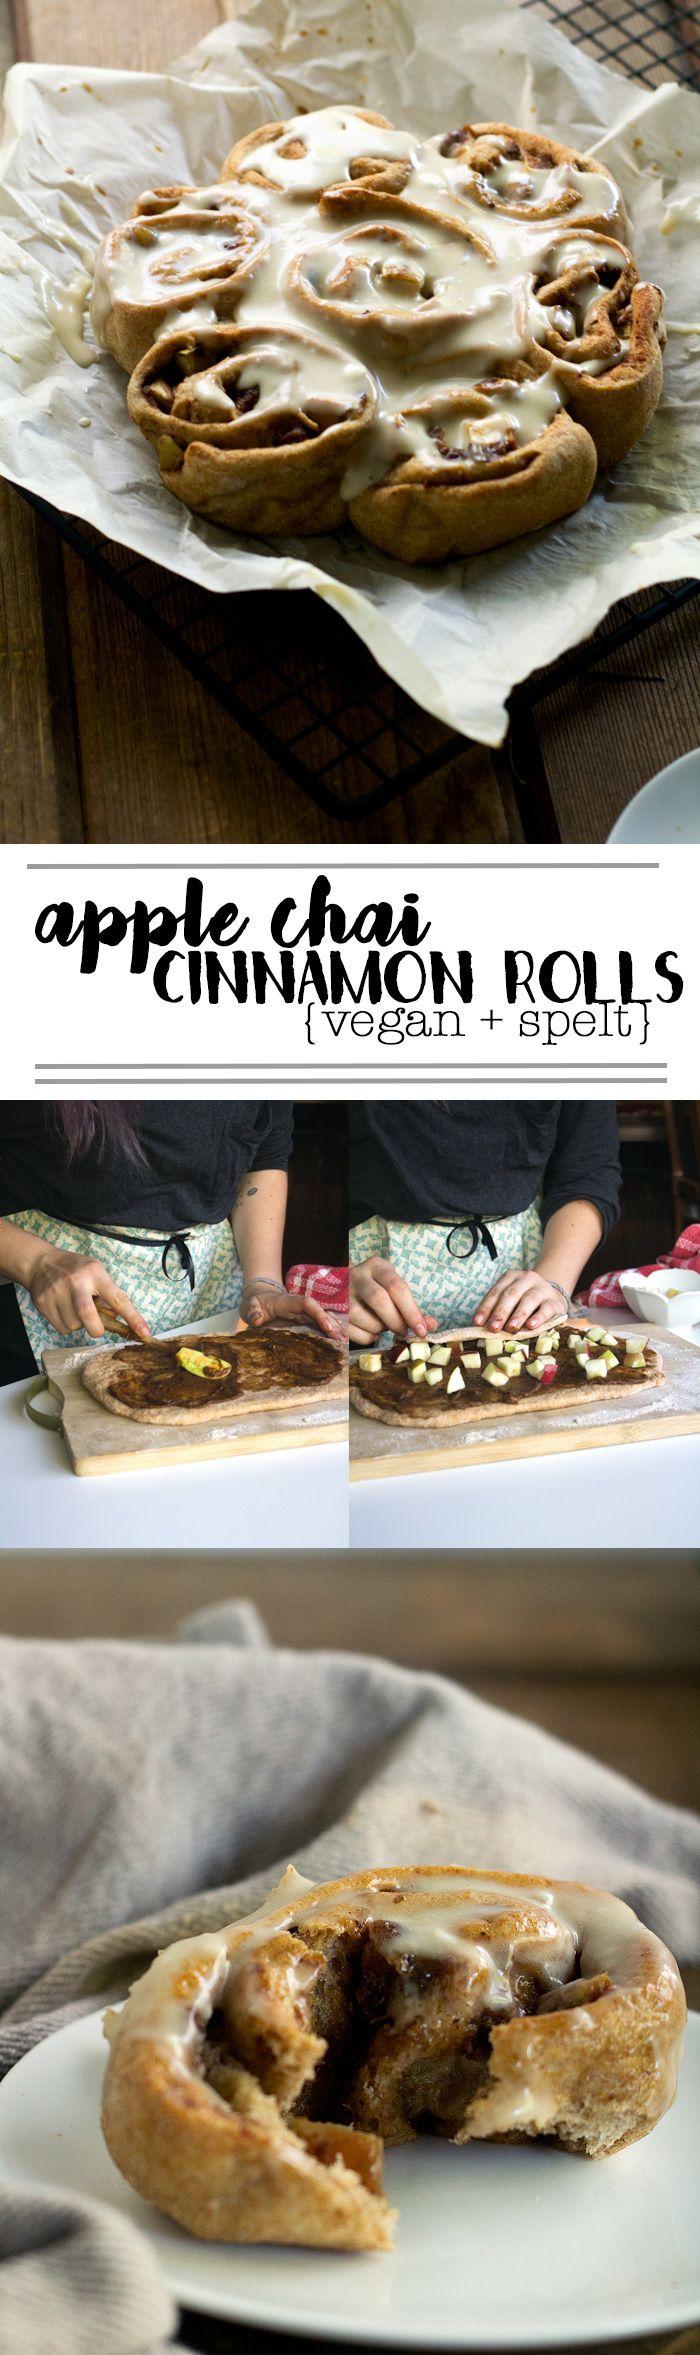 vegan apple chai cinnamon rolls made with spelt flour   love me, feed me